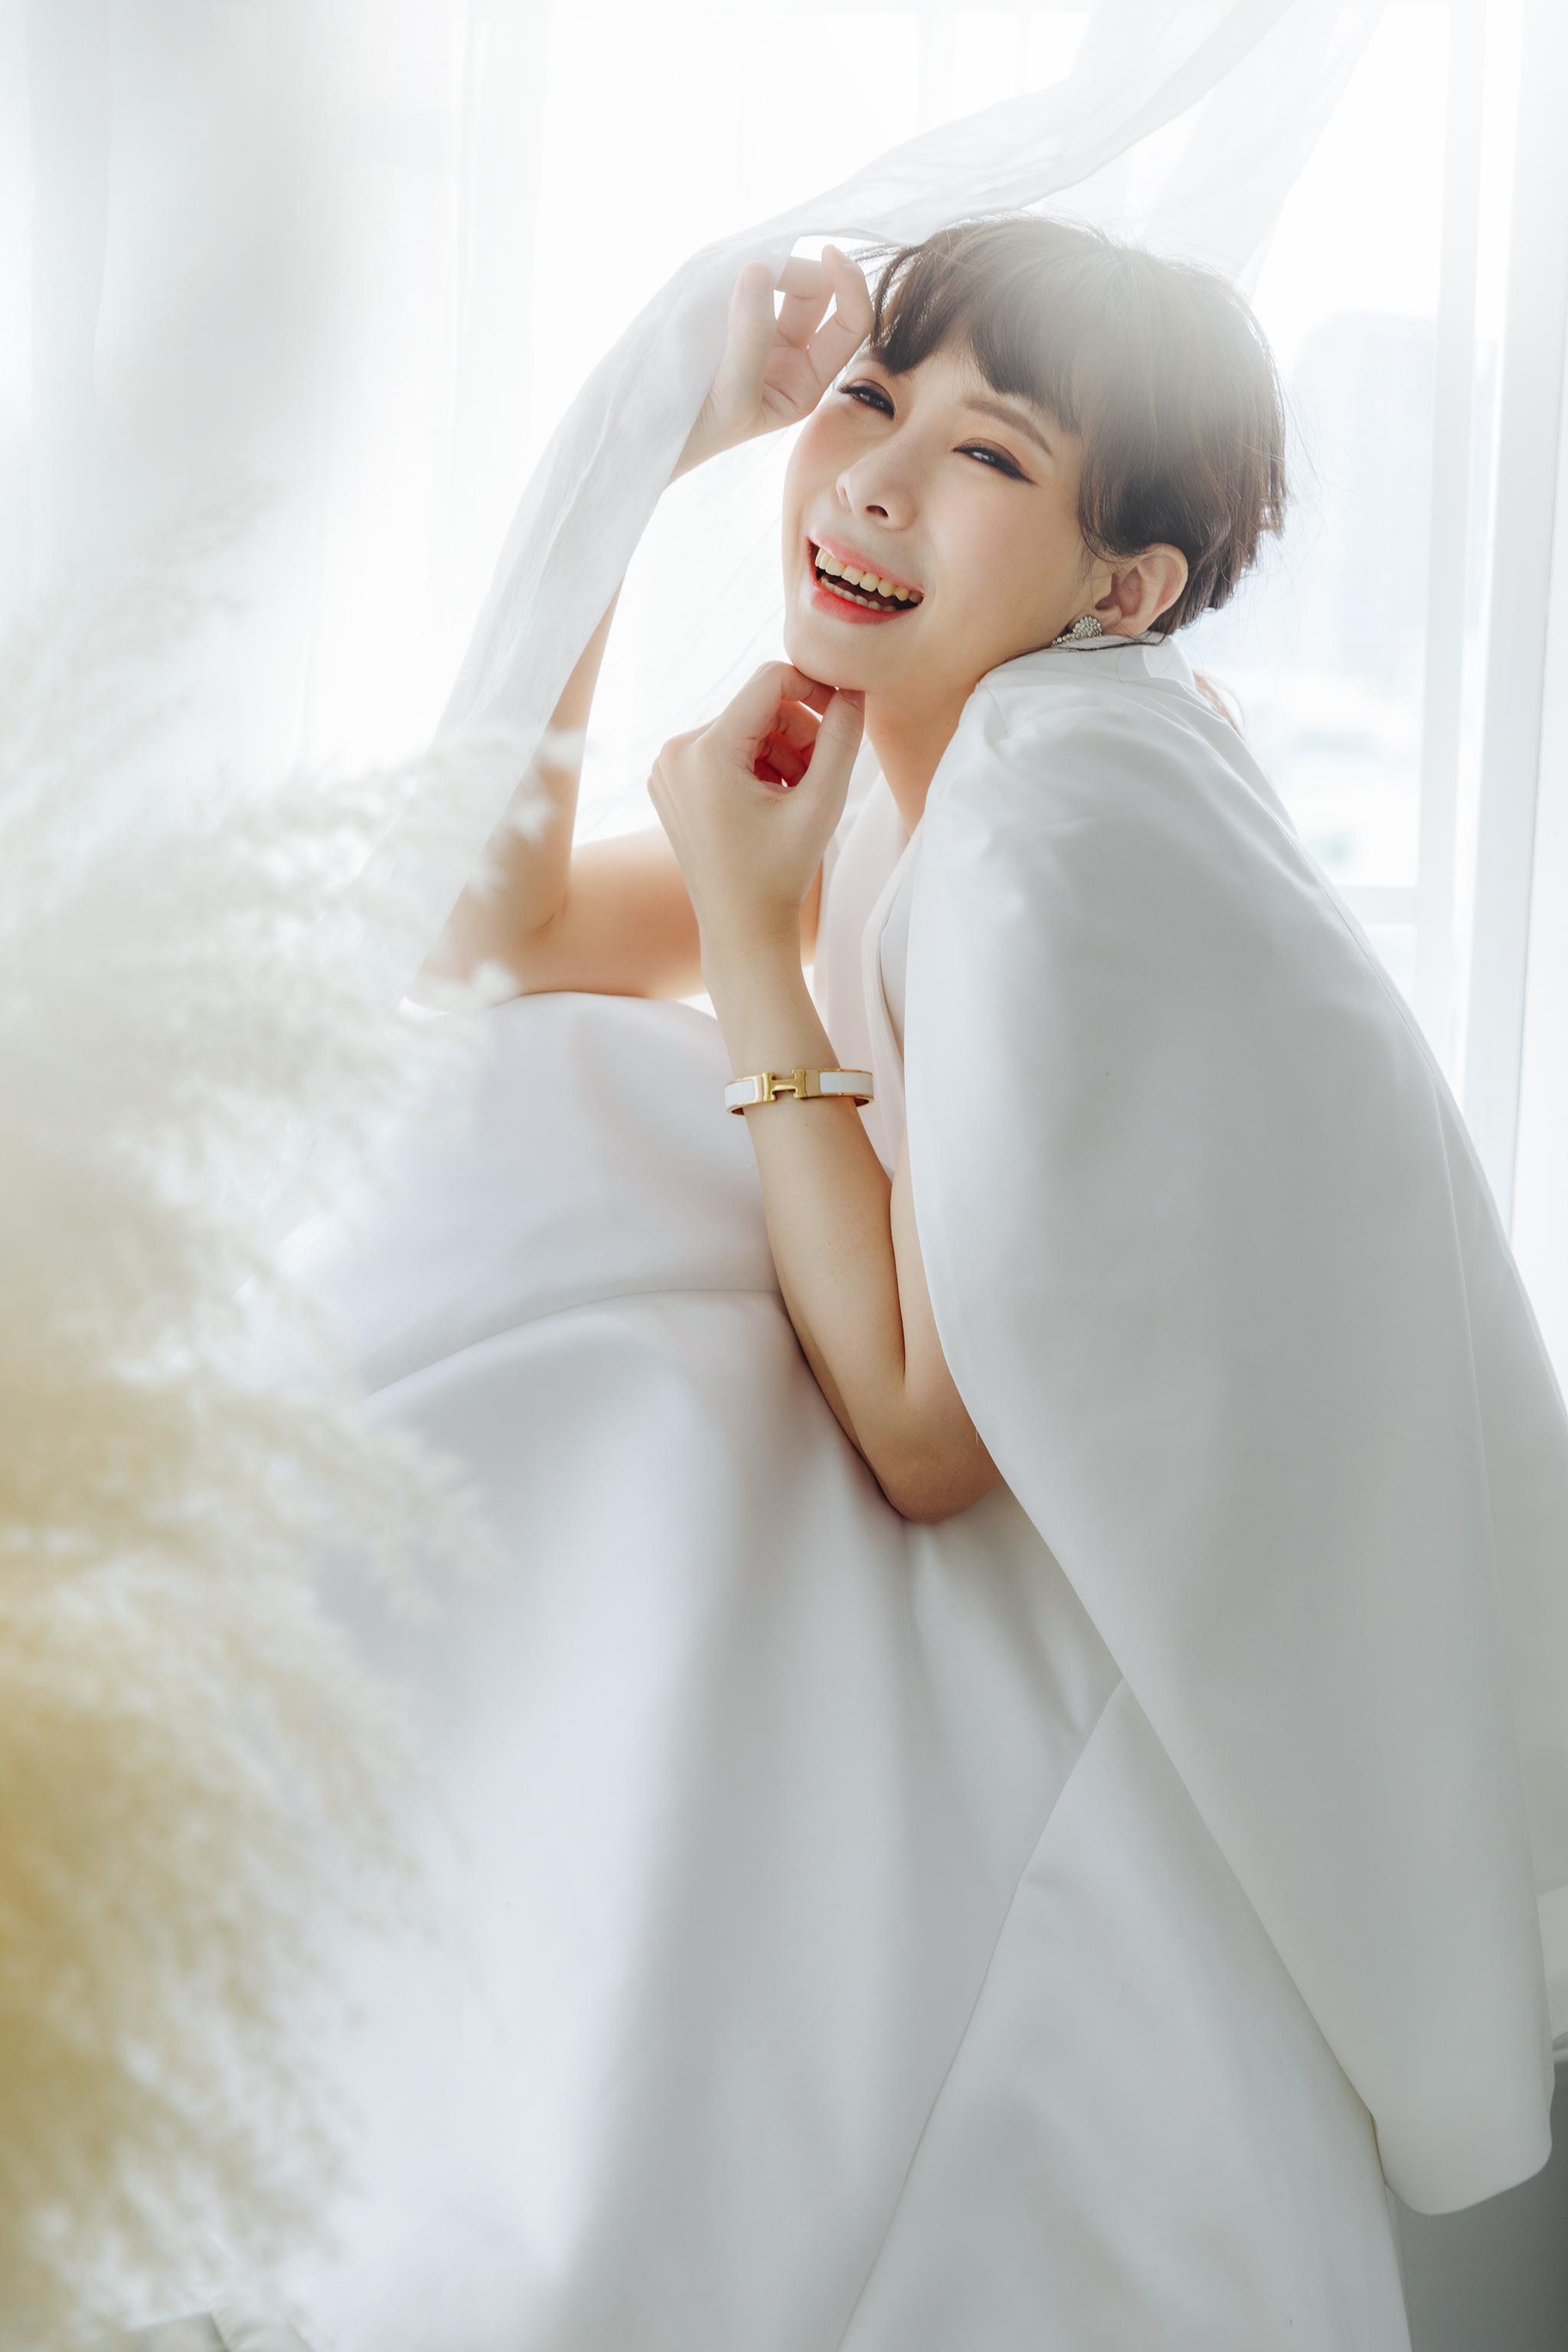 49883515382 8d1894eea2 o - 【自主婚紗】+潤潤+